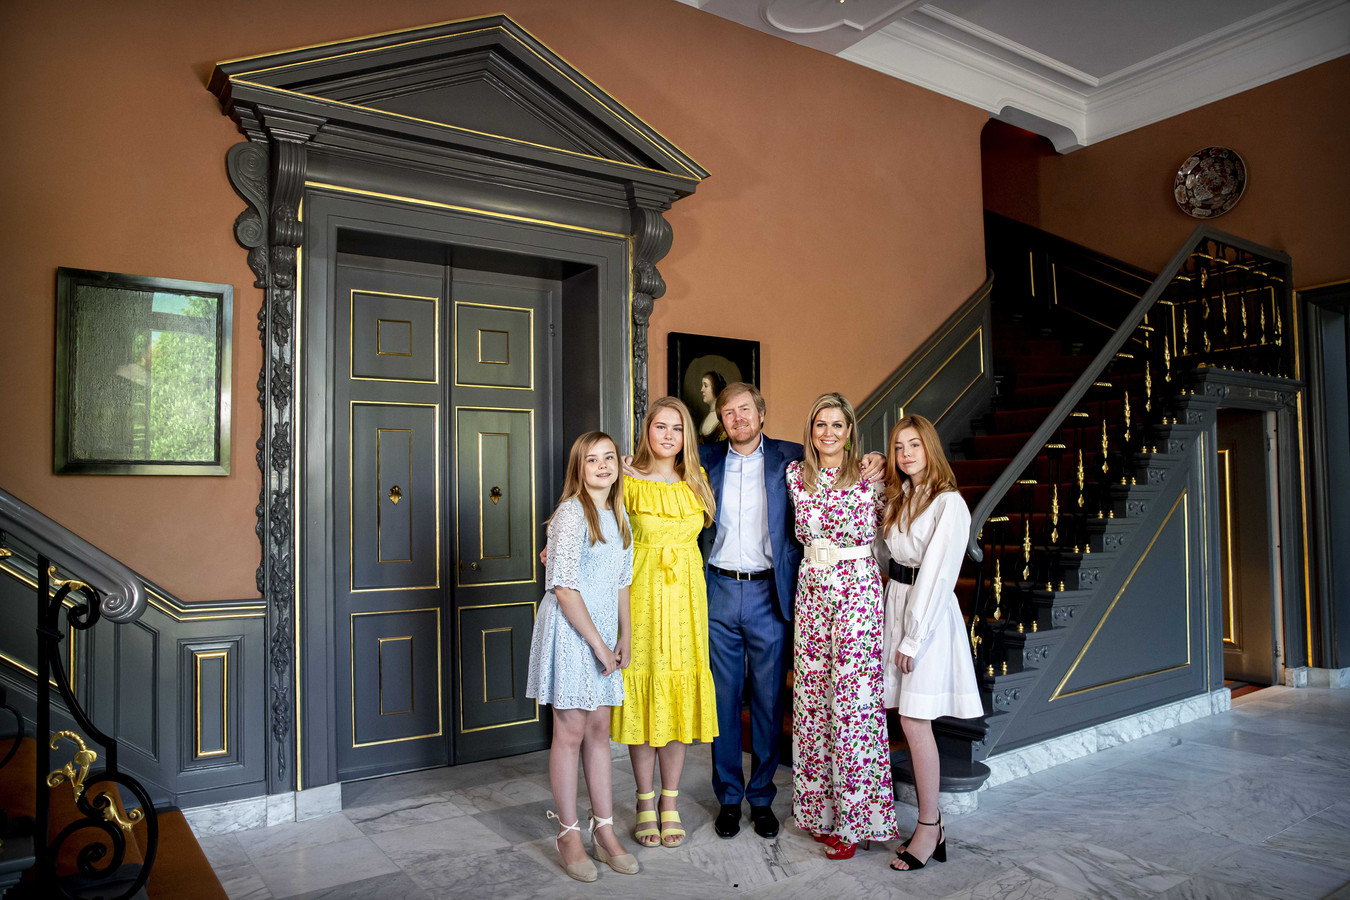 Koning Willem-Alexander, koningin Maxima en hun dochters, prinsessen Amalia, Alexia en Ariane vieren Koningsdag in Paleis Huis ten Bosch.